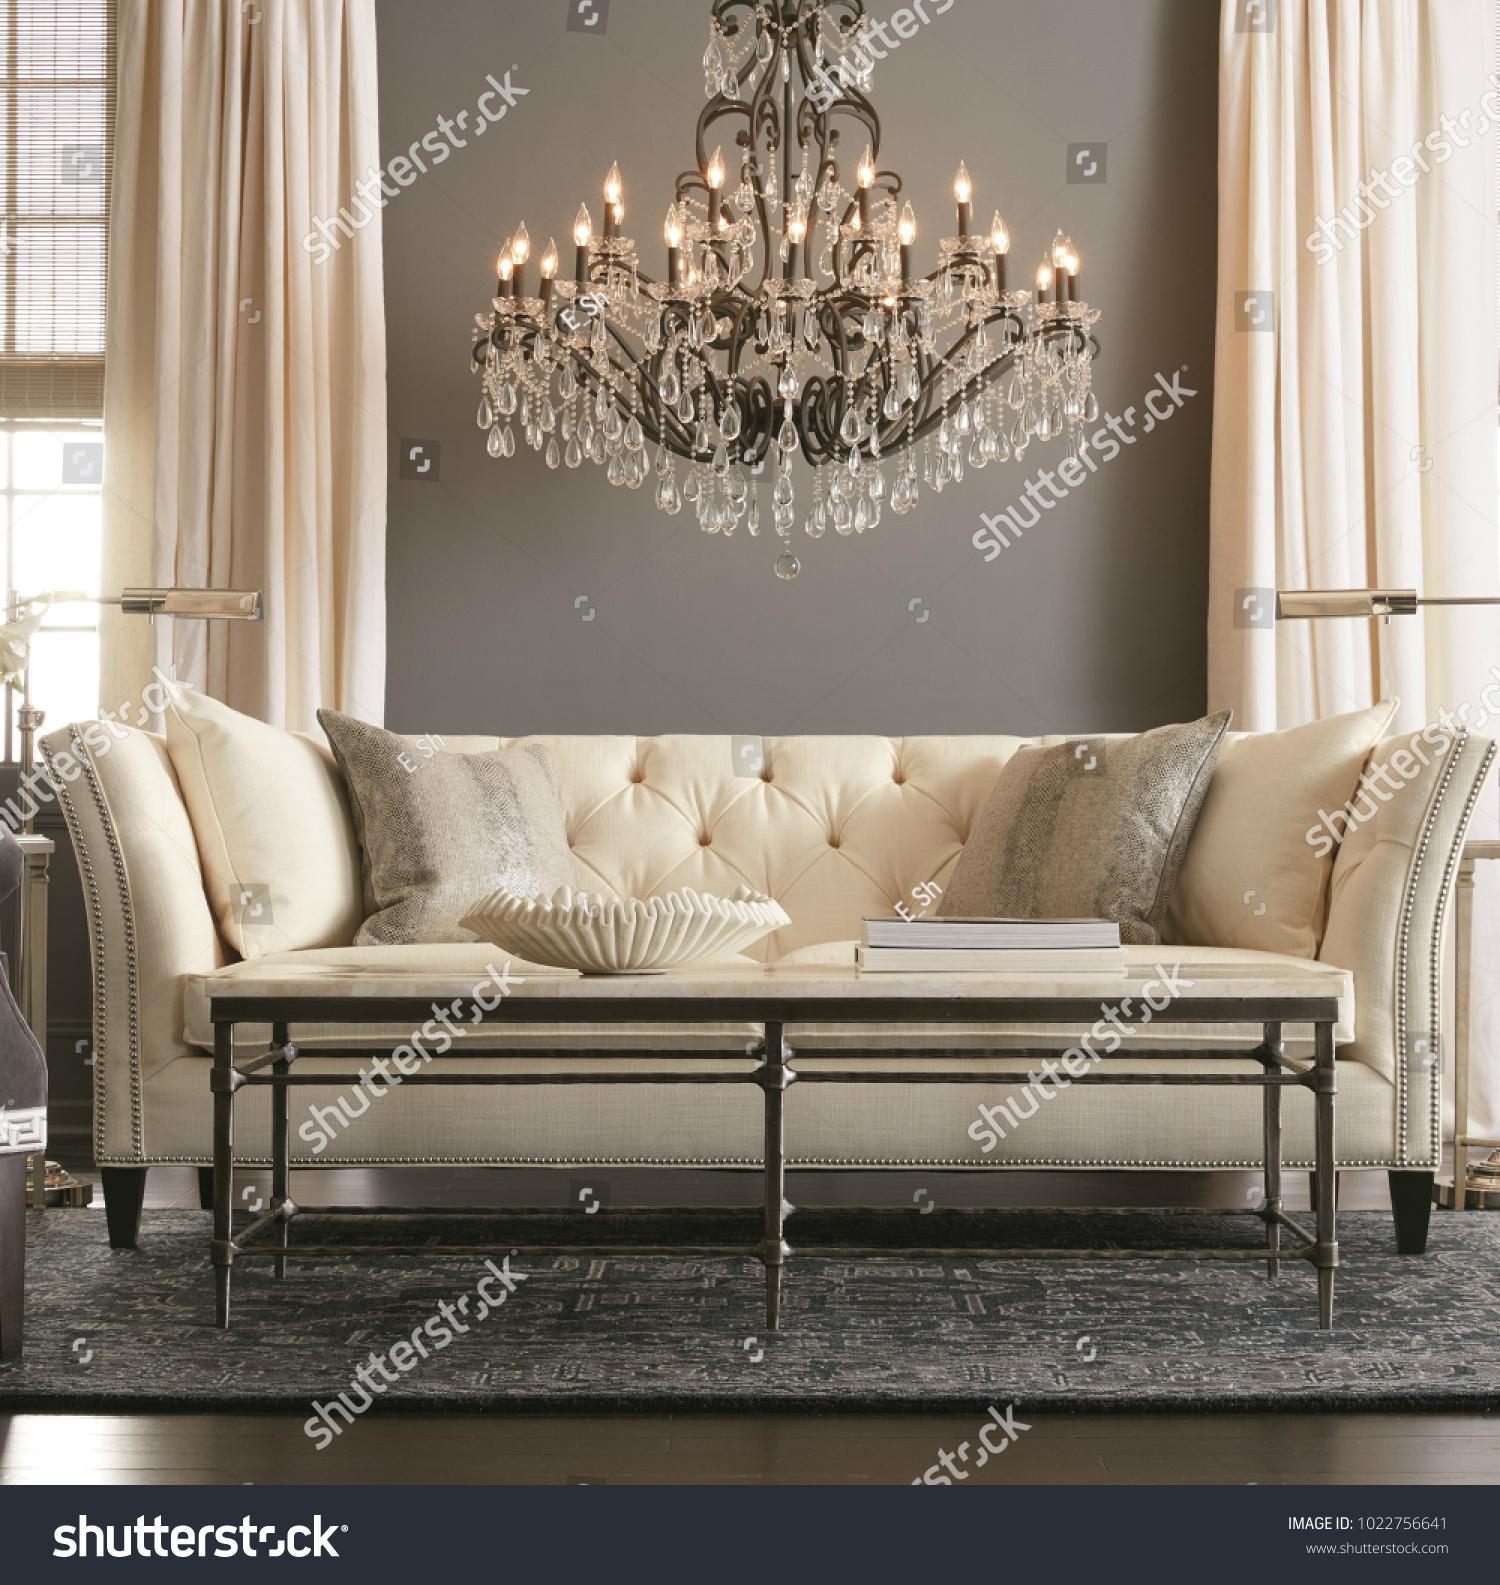 Luxury interiors guest room living room imagen de archivo stock luxury interiors guest room living room imagen de archivo stock 1022756641 shutterstock aloadofball Images